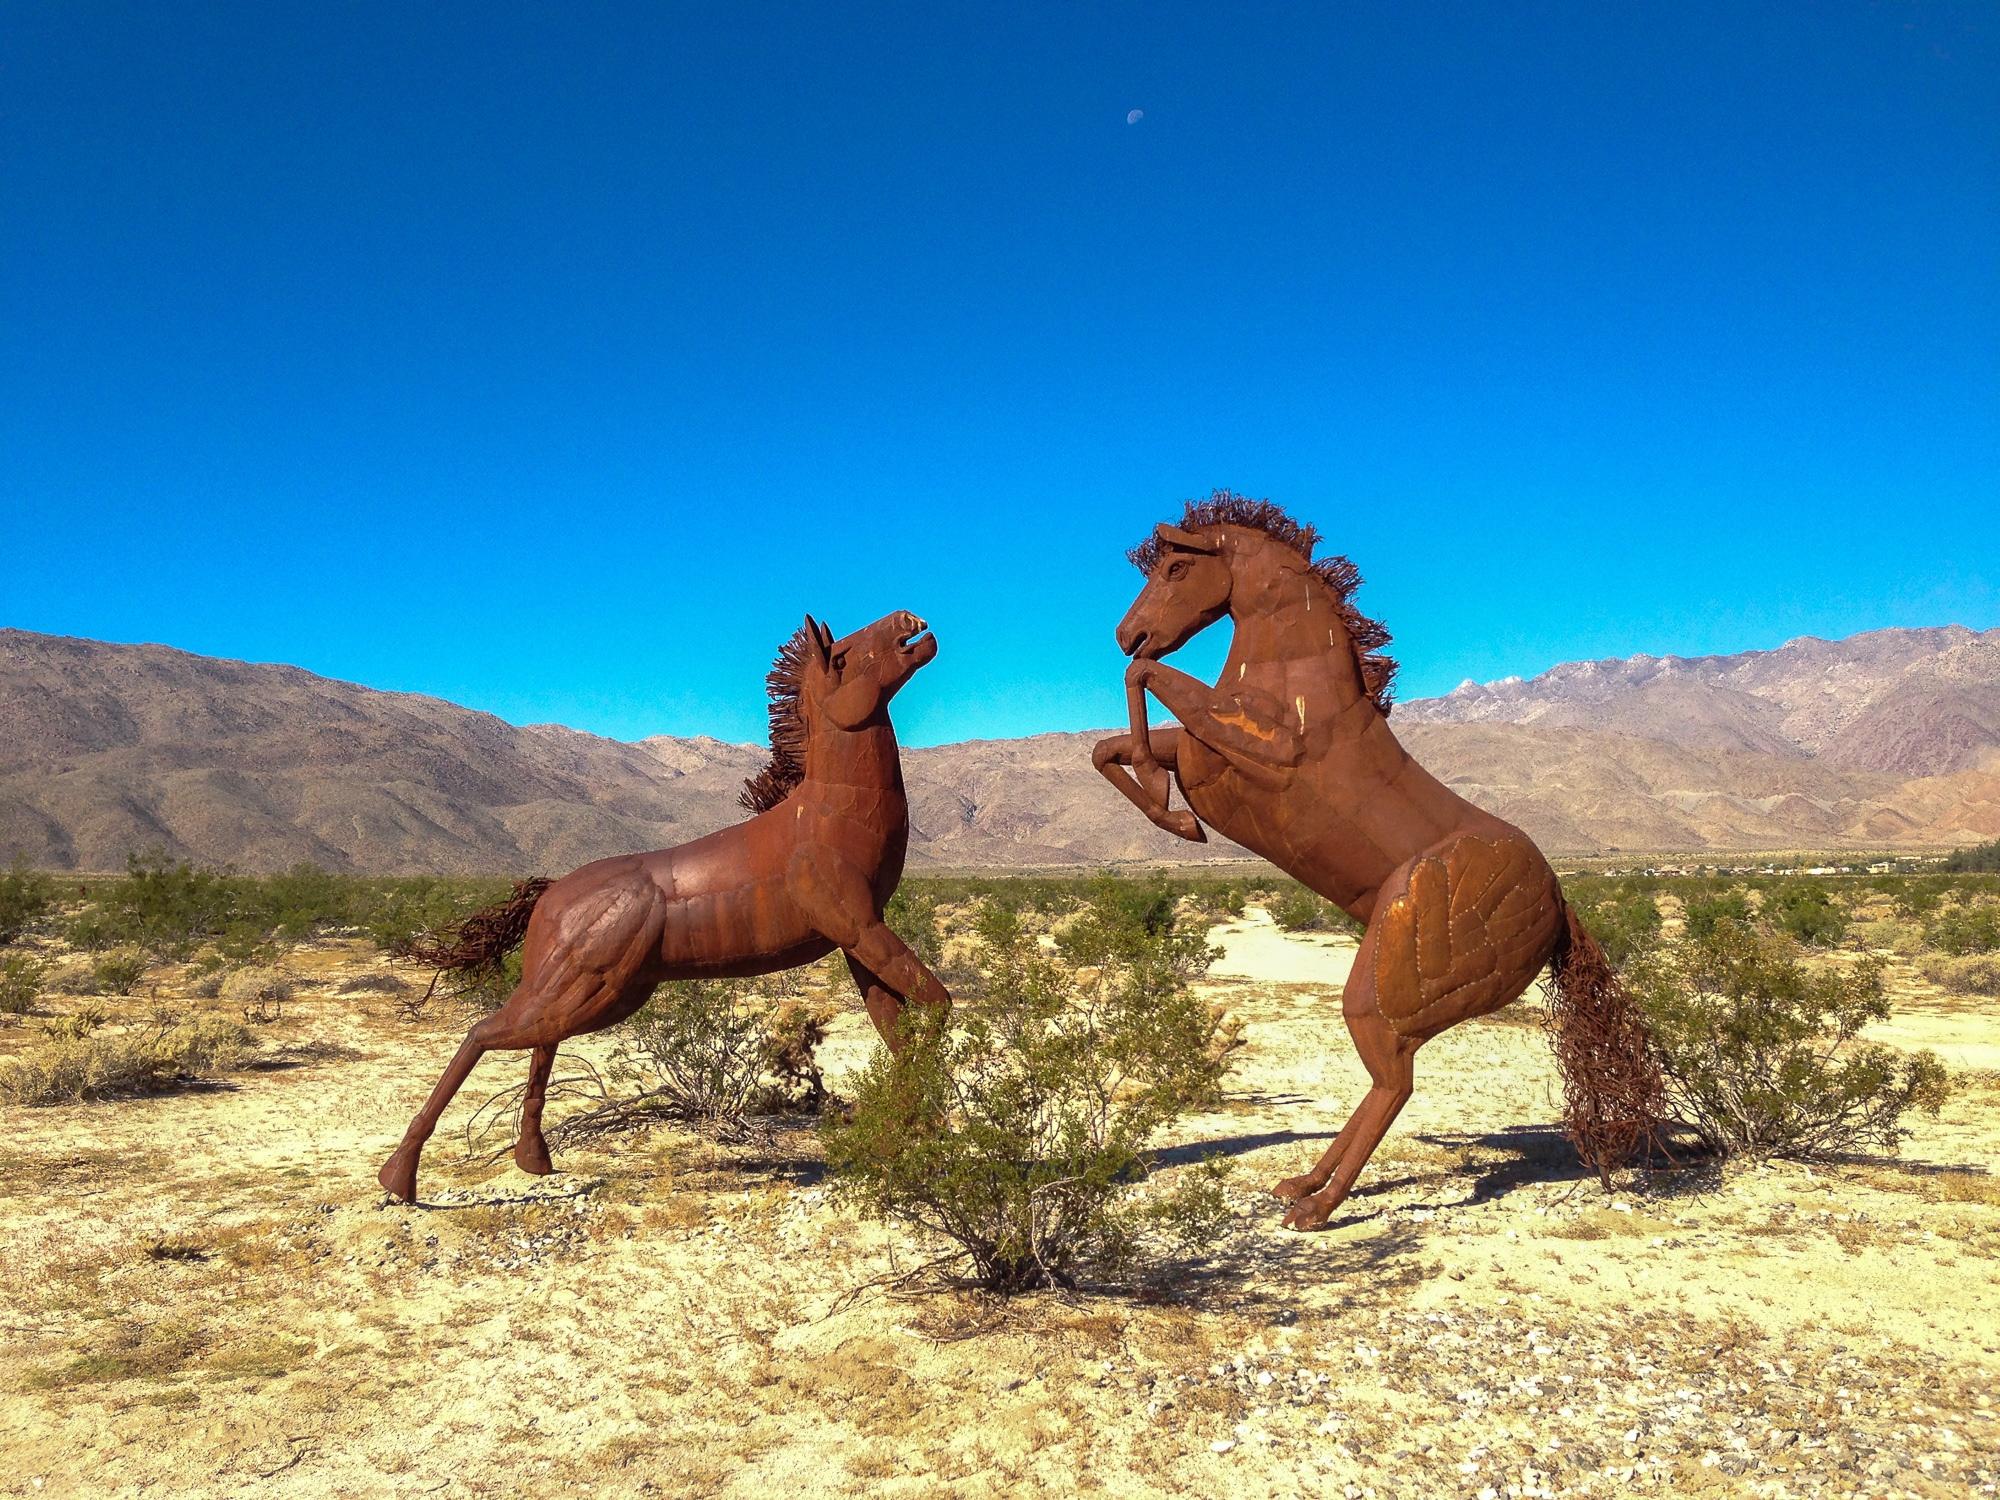 Horse sculptures by Artist Ricardo Breceda in Borrego Springs